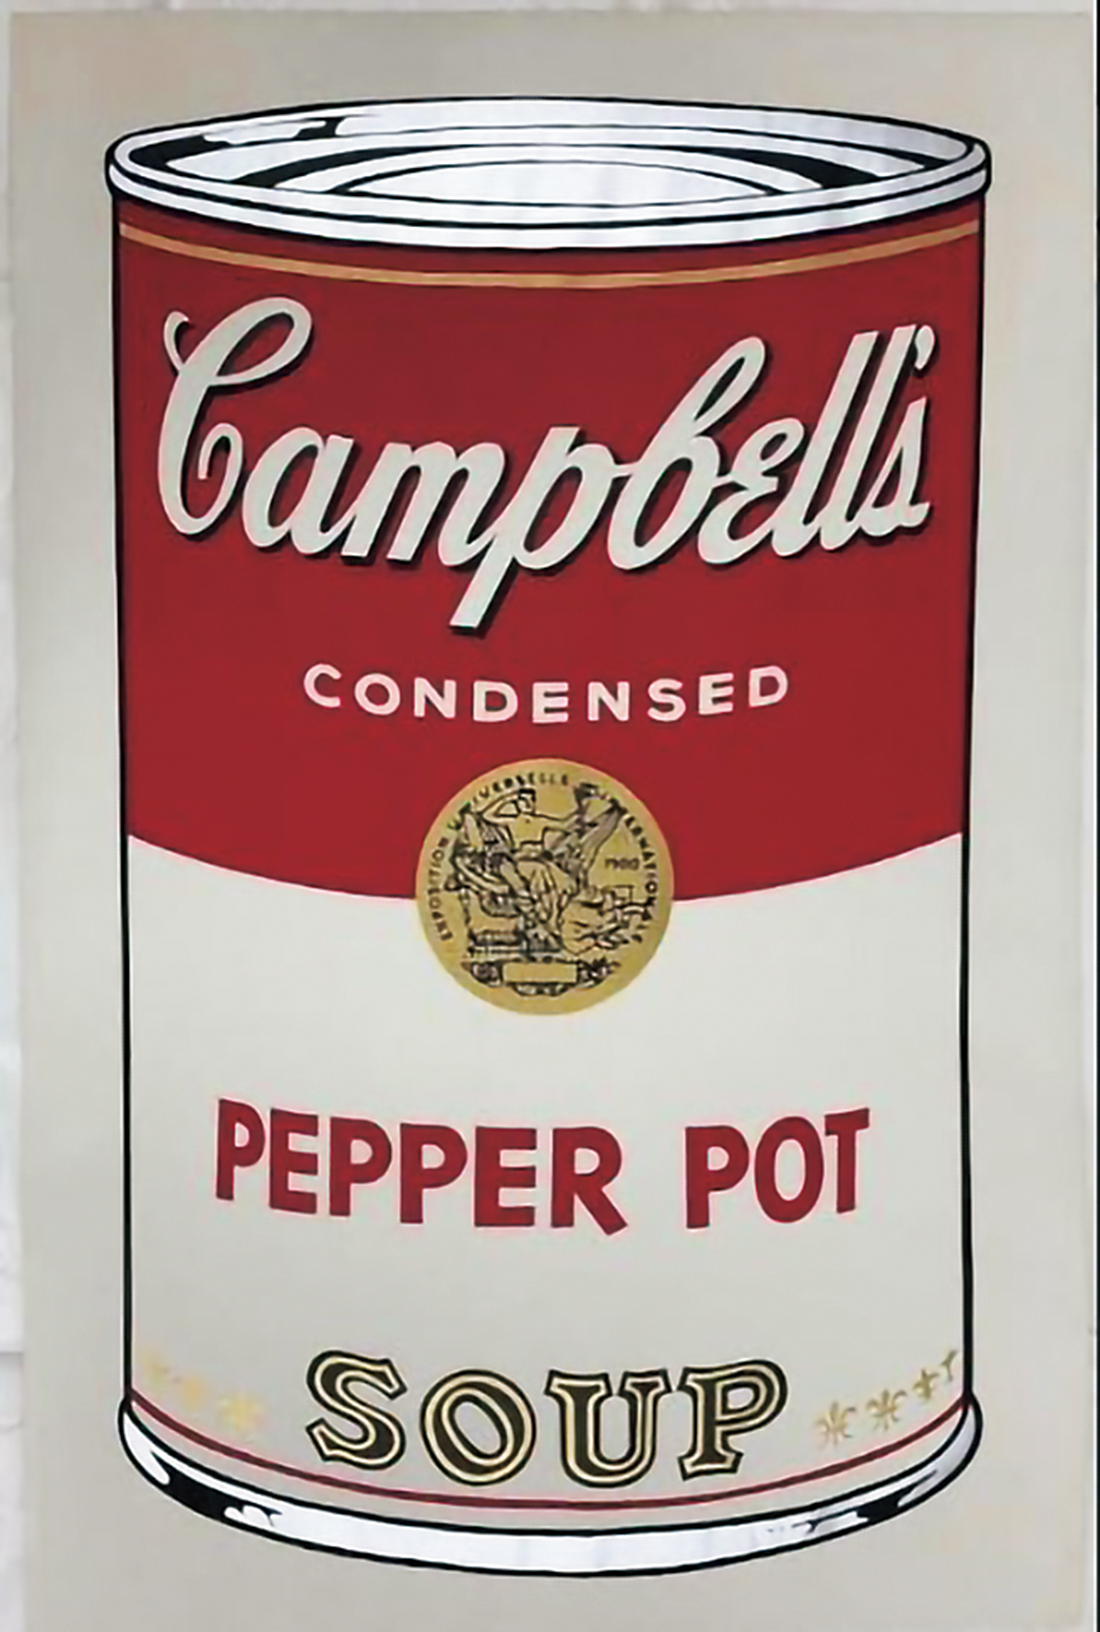 『Campbell's Soup Ⅰ(Pepper Pot)』